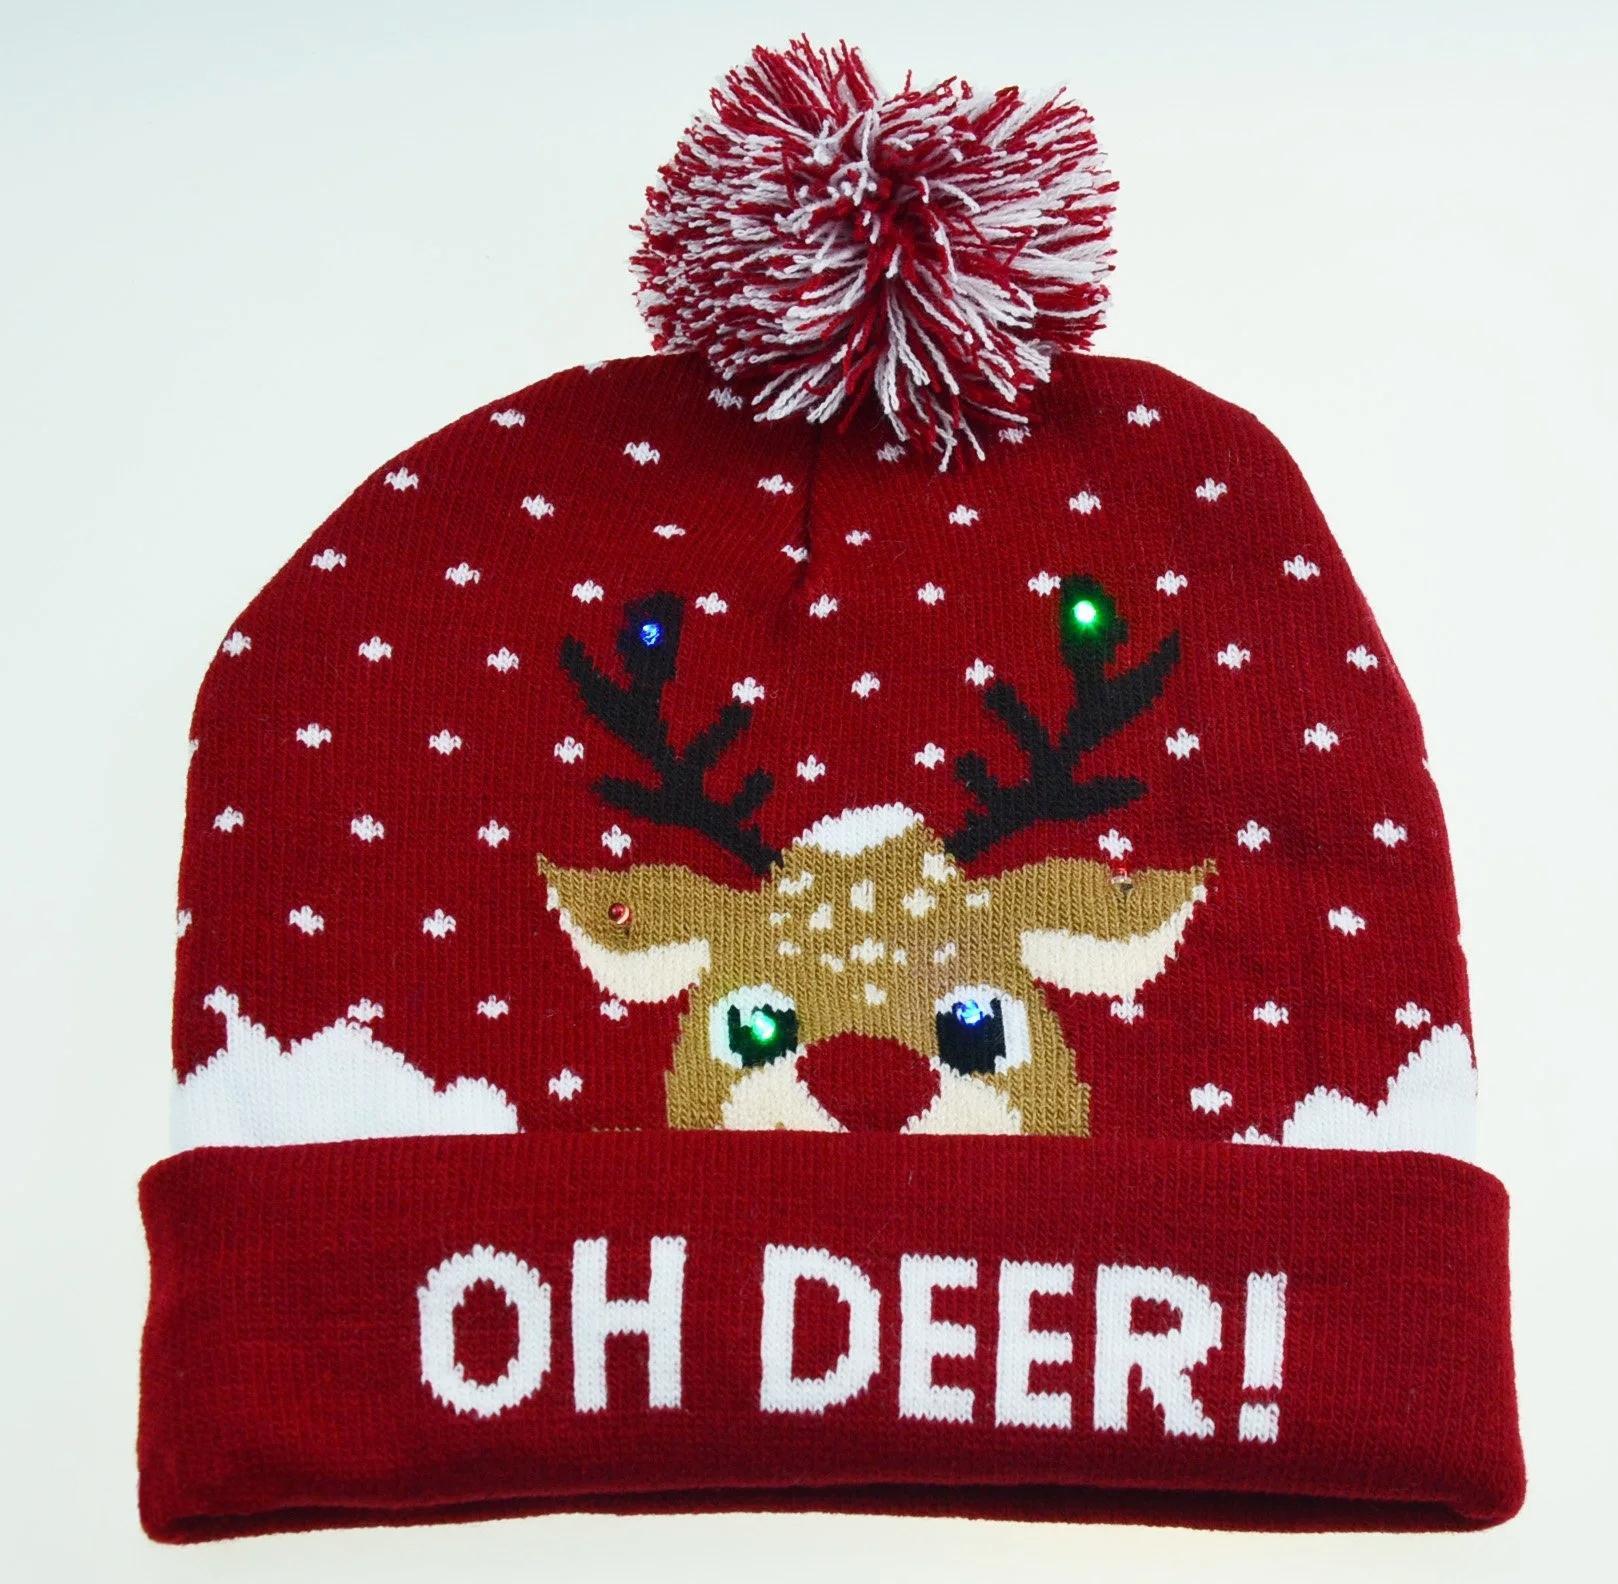 Holiday Custom Led Knitted Hat/ Led Beanie Hat/ Led Winter Gorros Hat 5